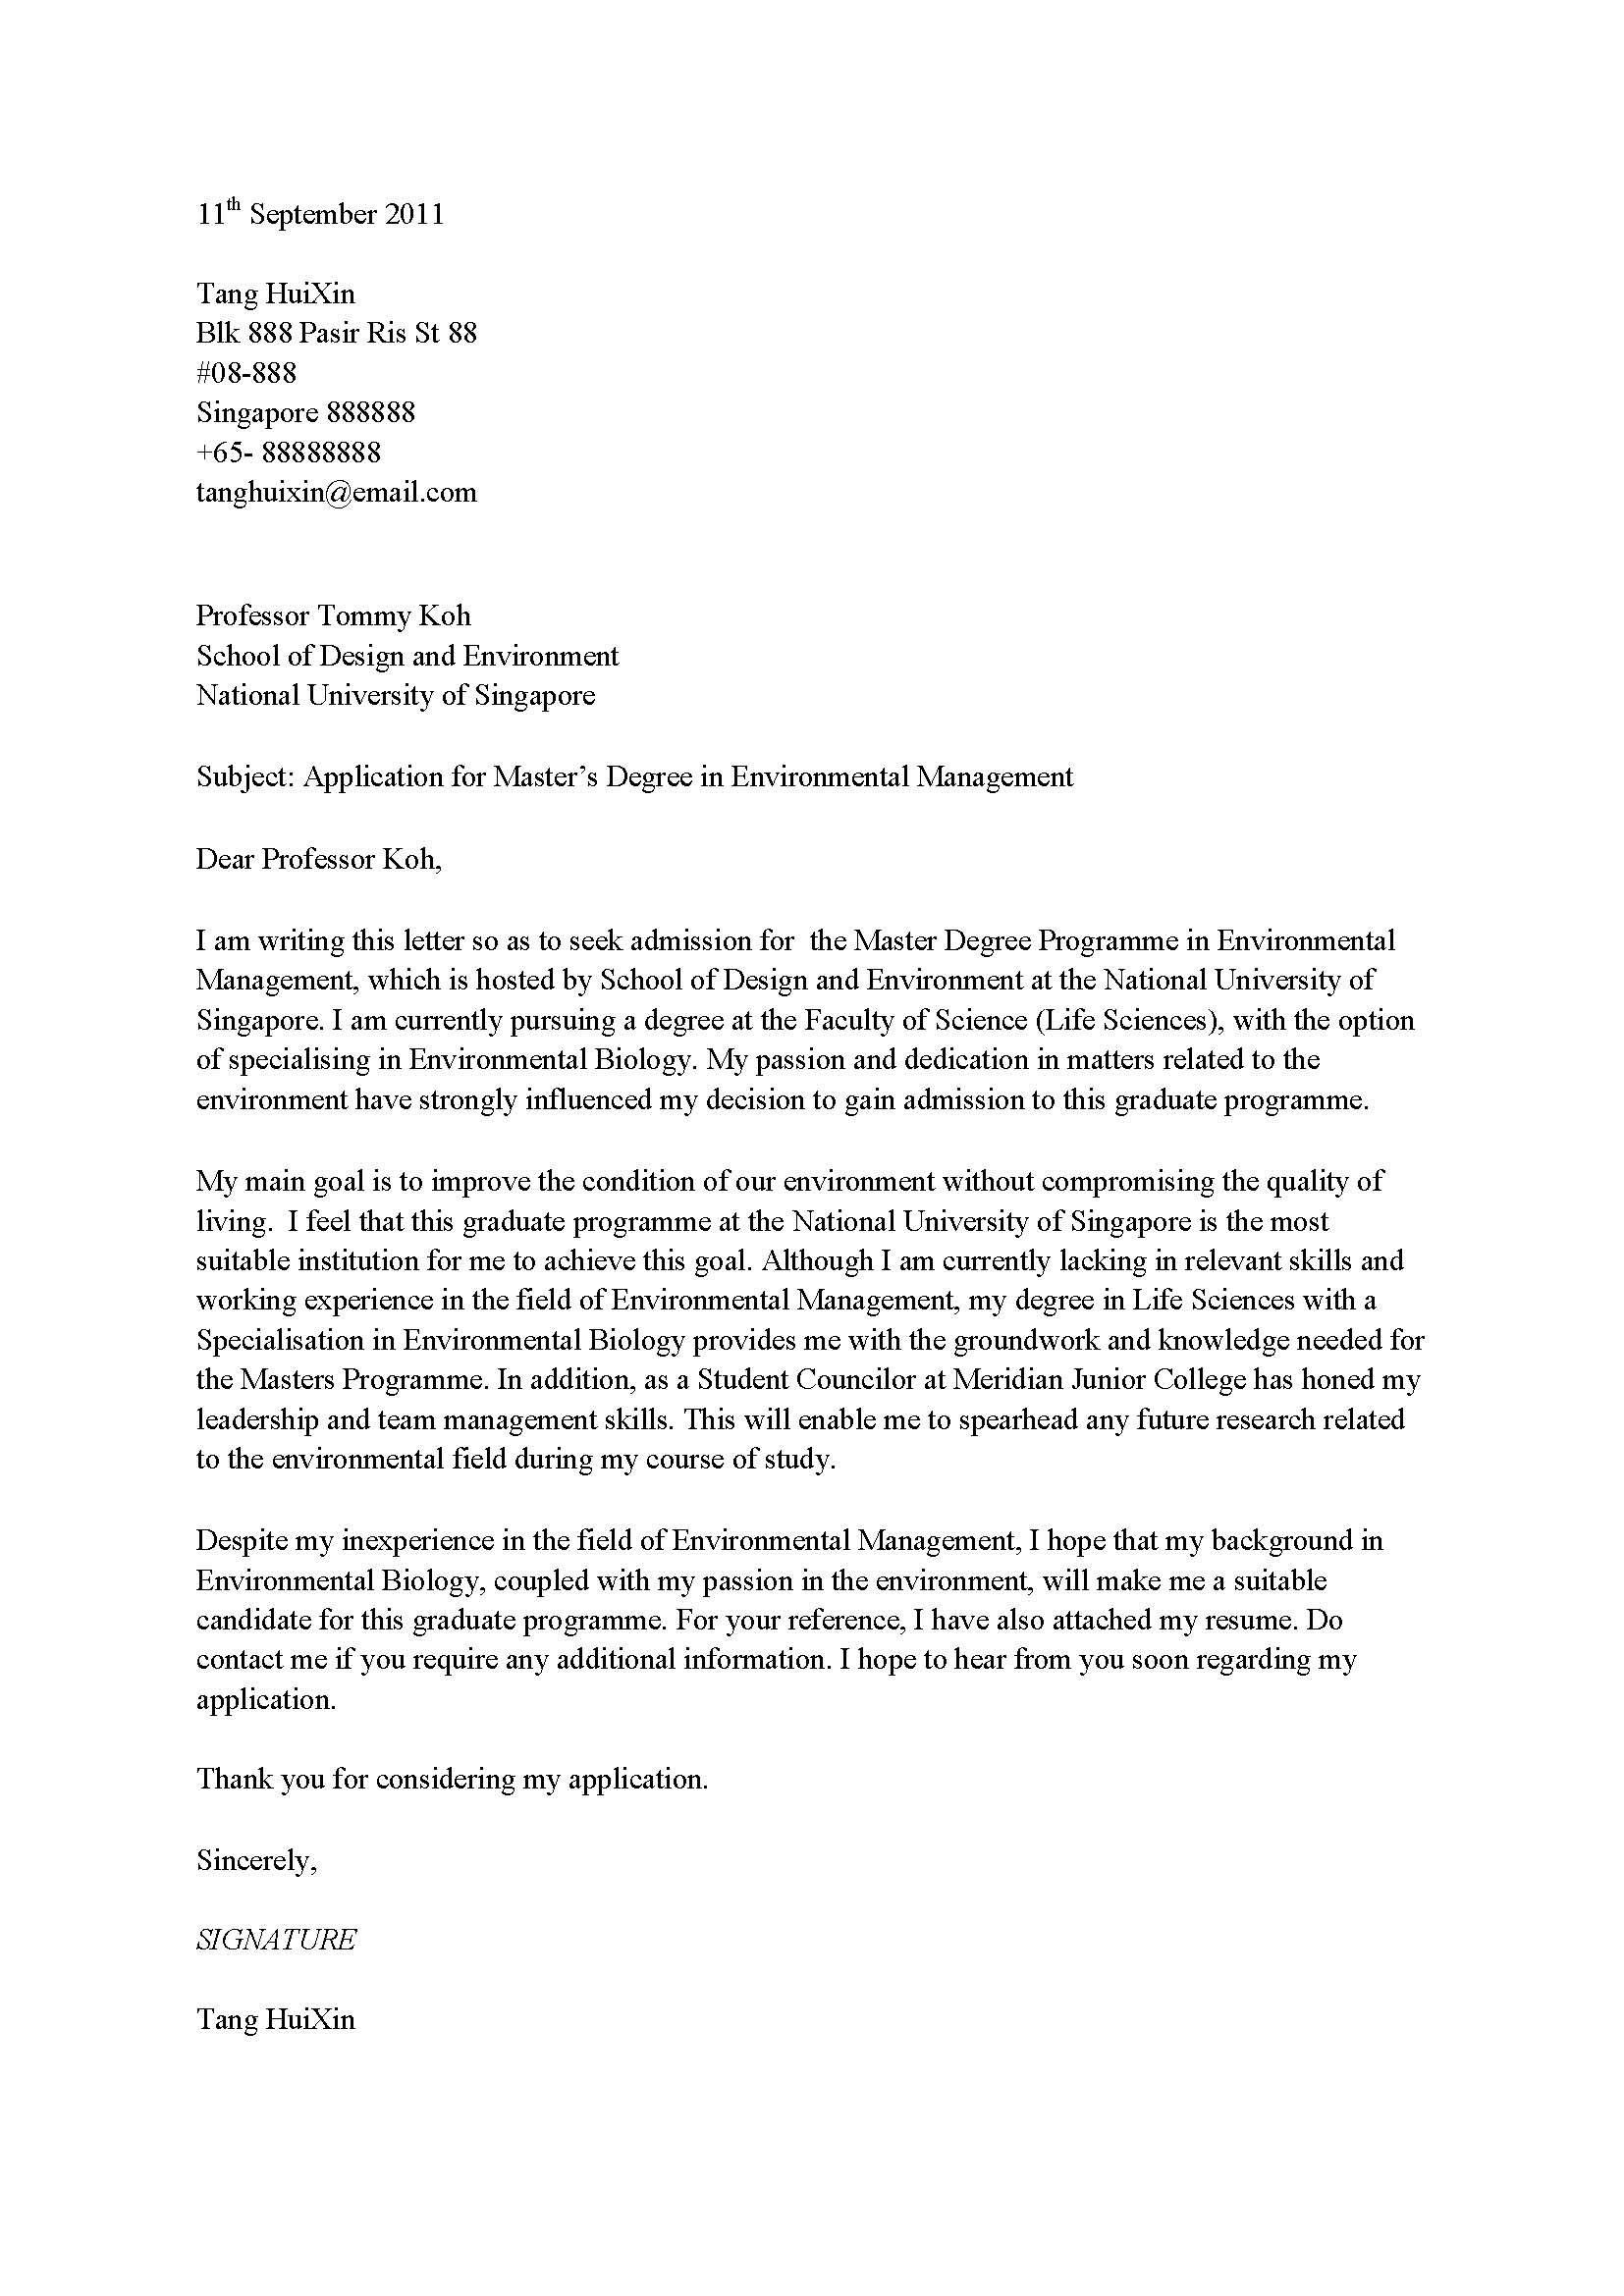 Admission Application Letter  Application request letter